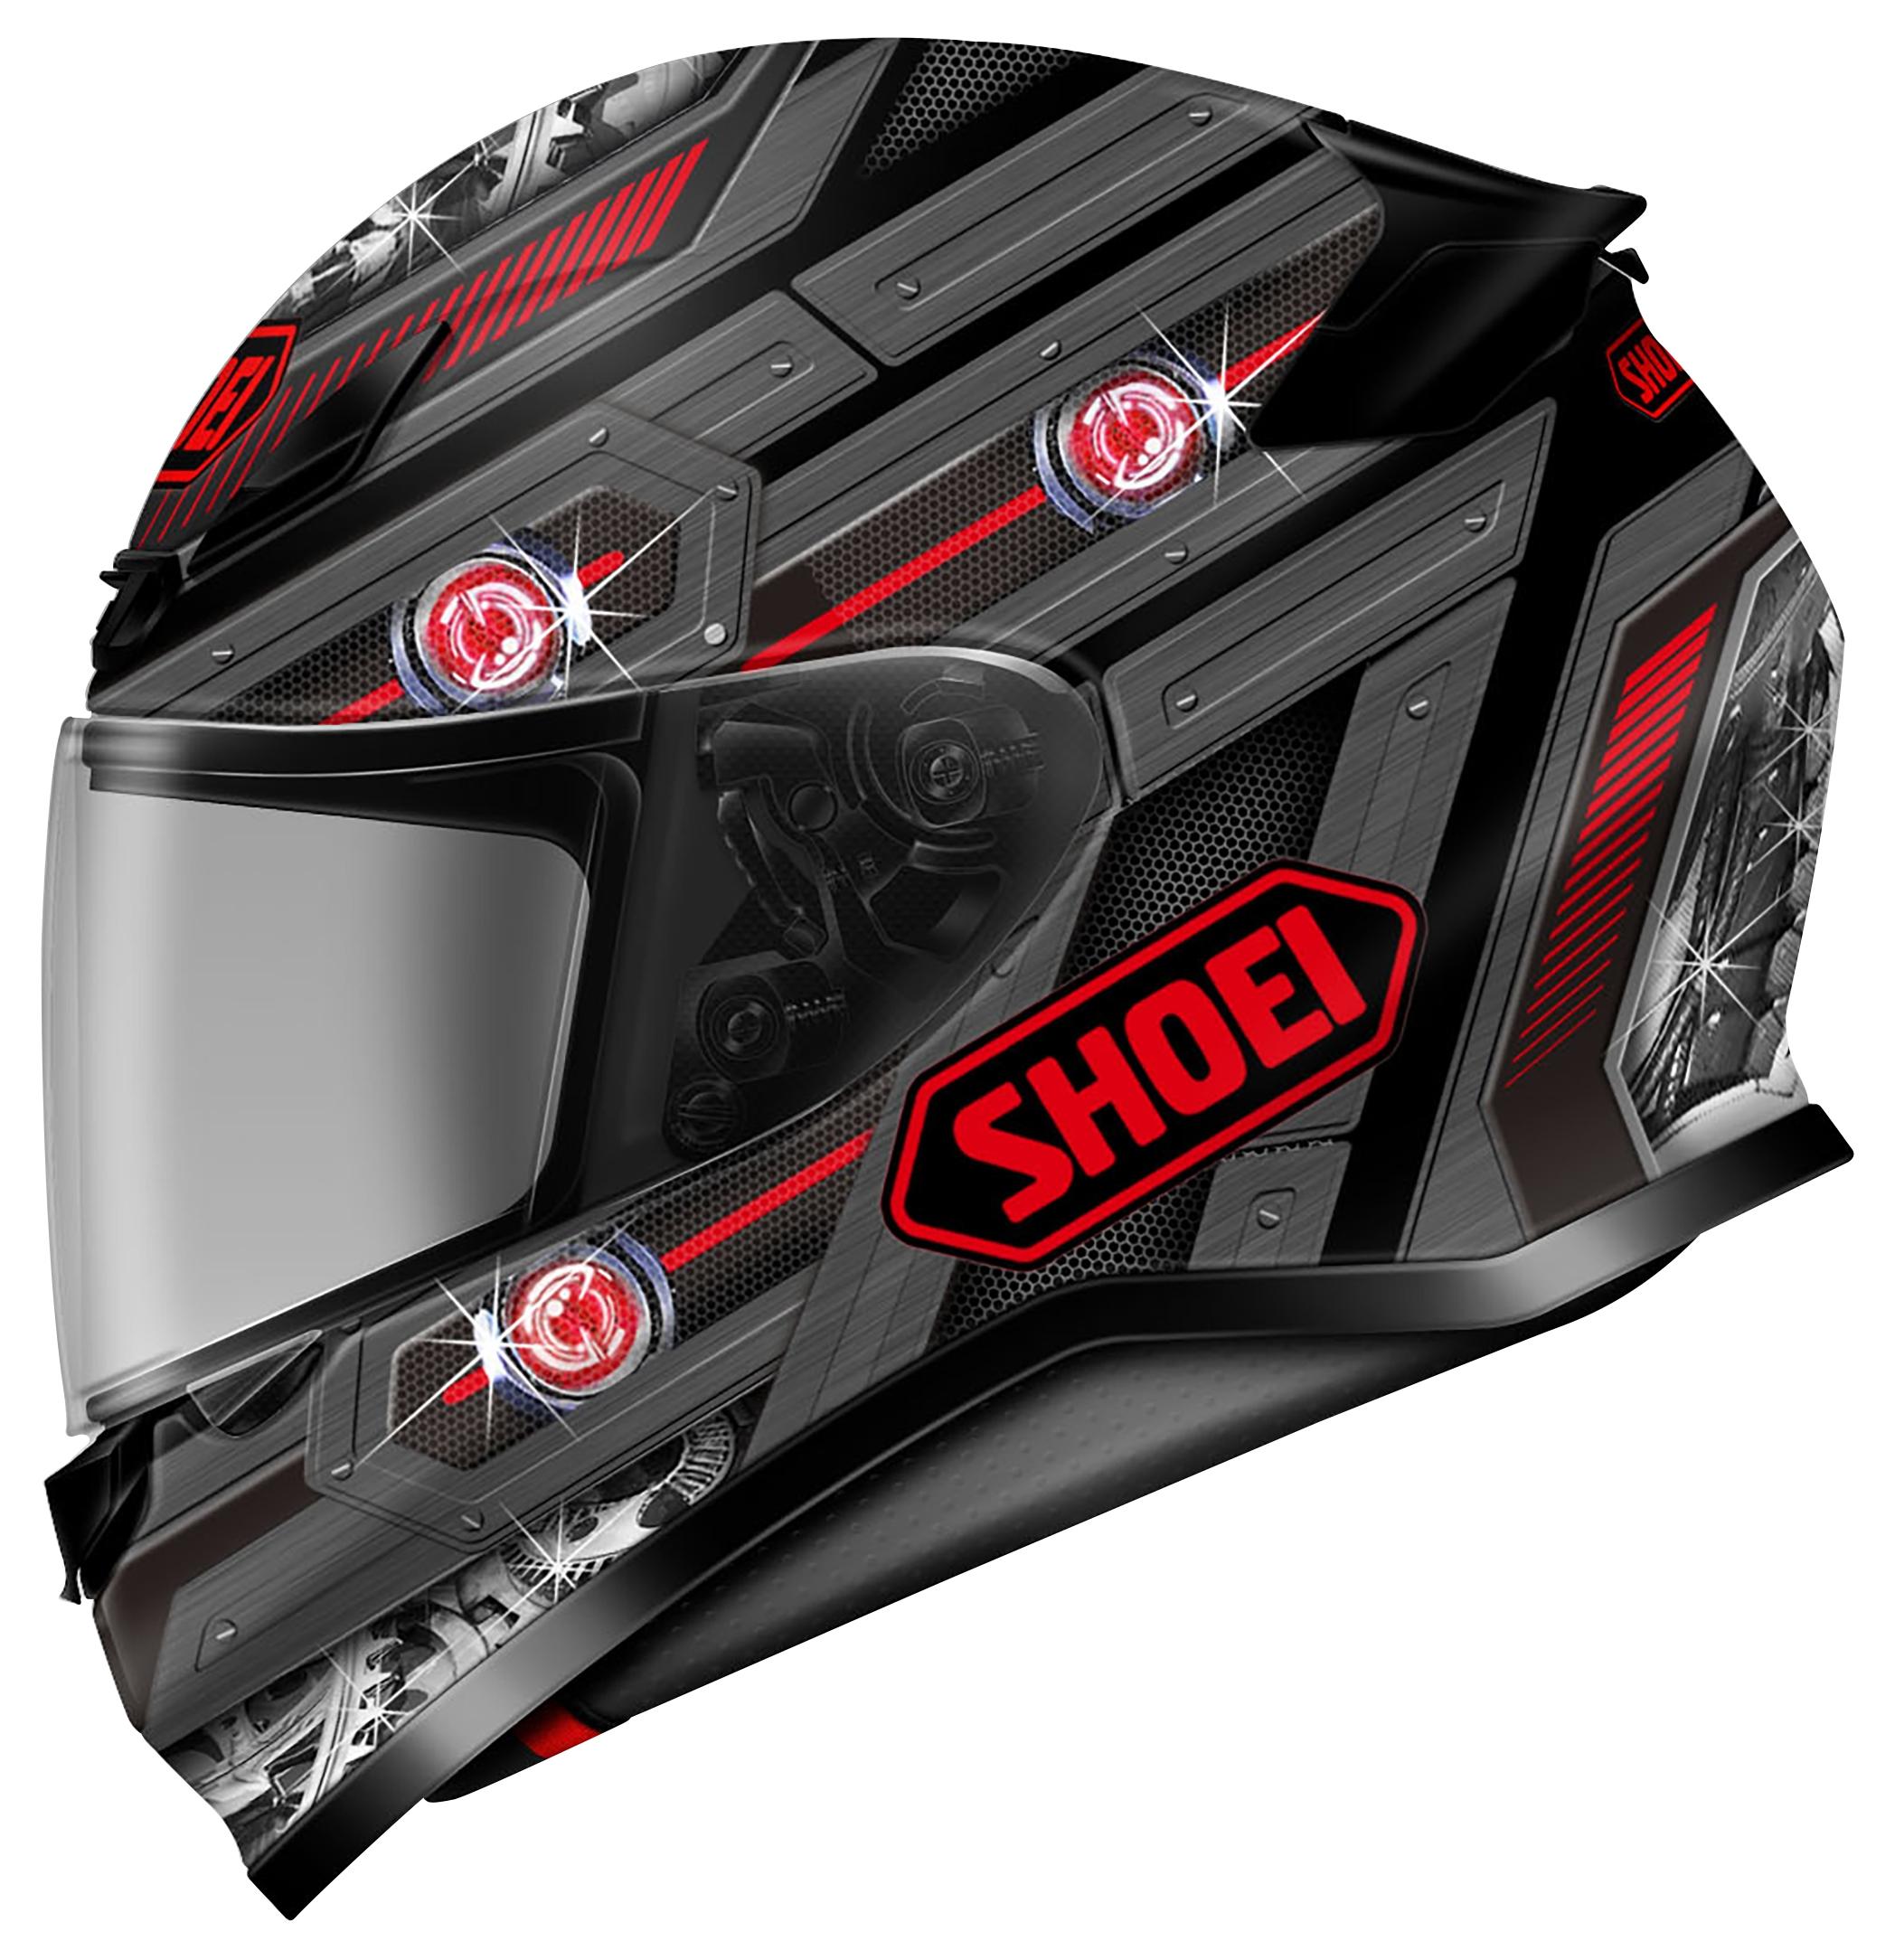 shoei rf 1200 trooper helmet cycle gear. Black Bedroom Furniture Sets. Home Design Ideas